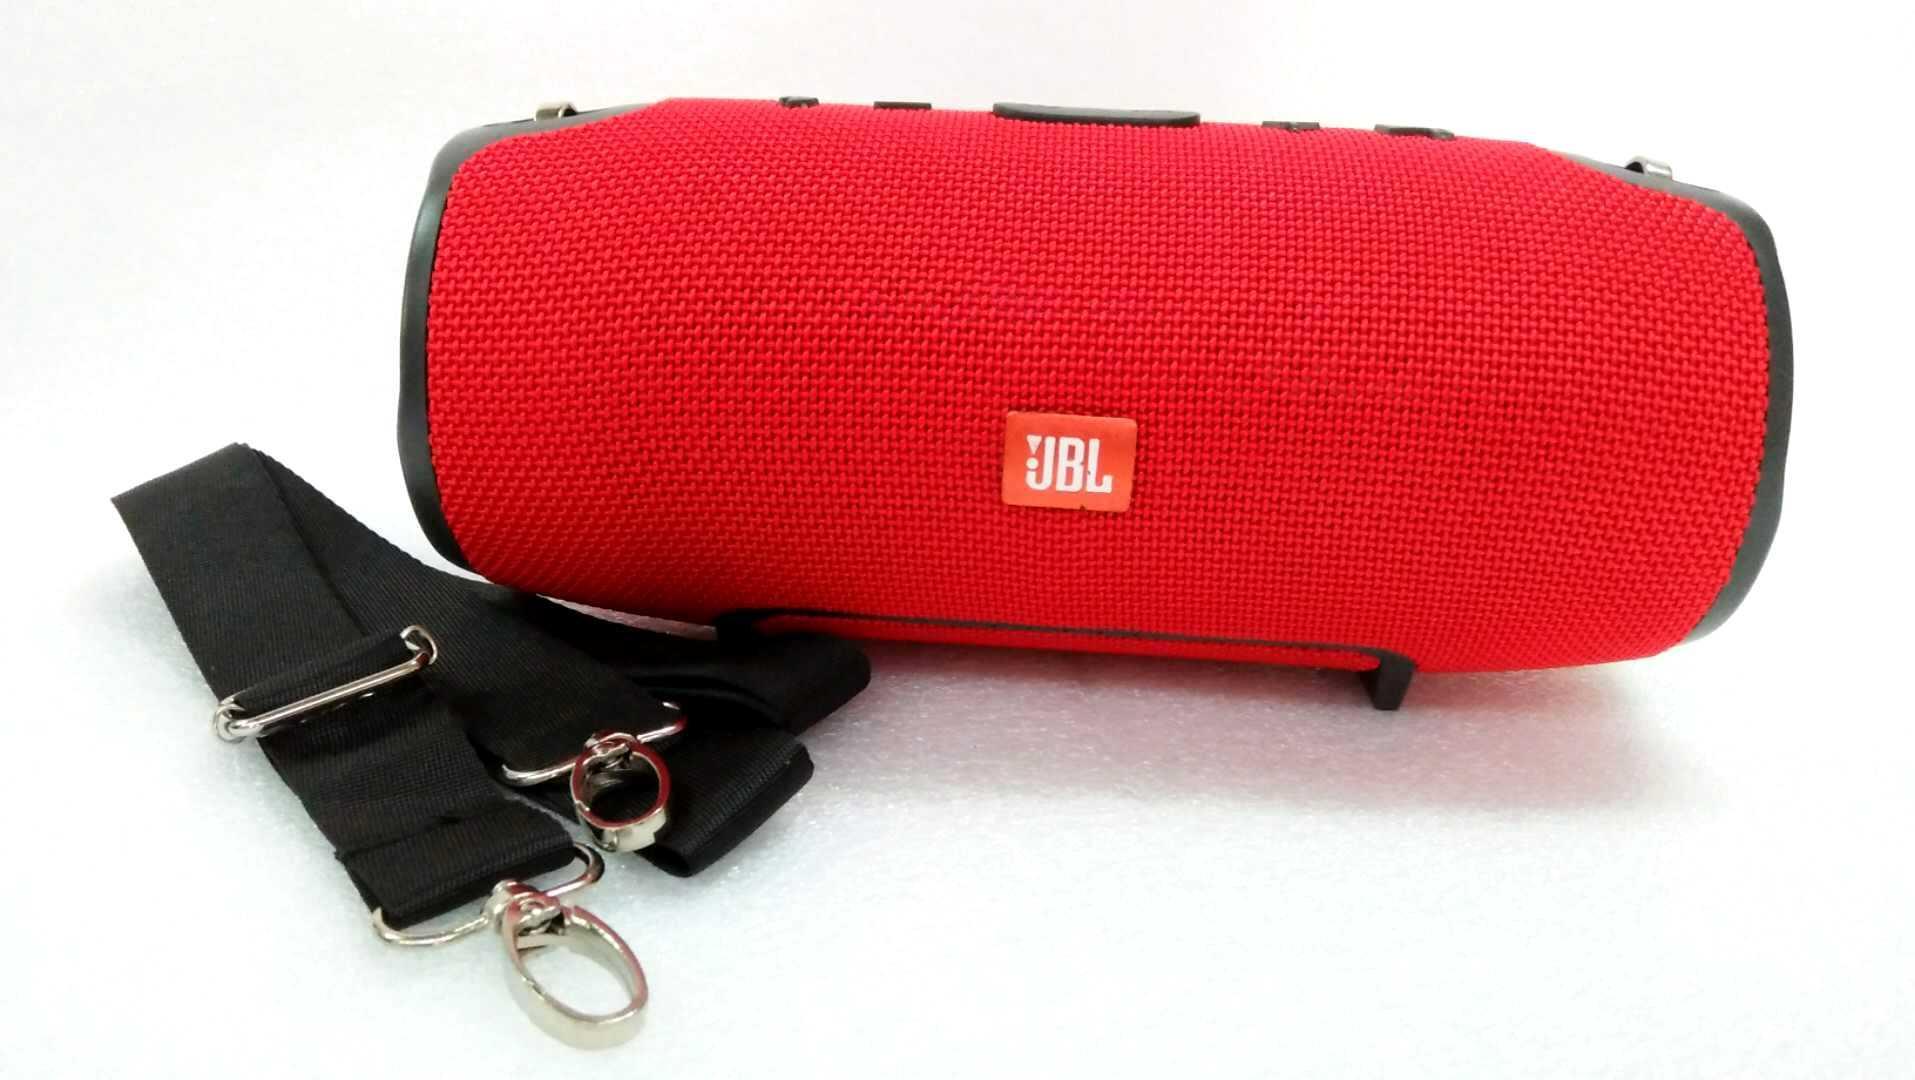 Jbl Xtreme Mini Portable Wireless Bluetooth Speaker Philippines Red